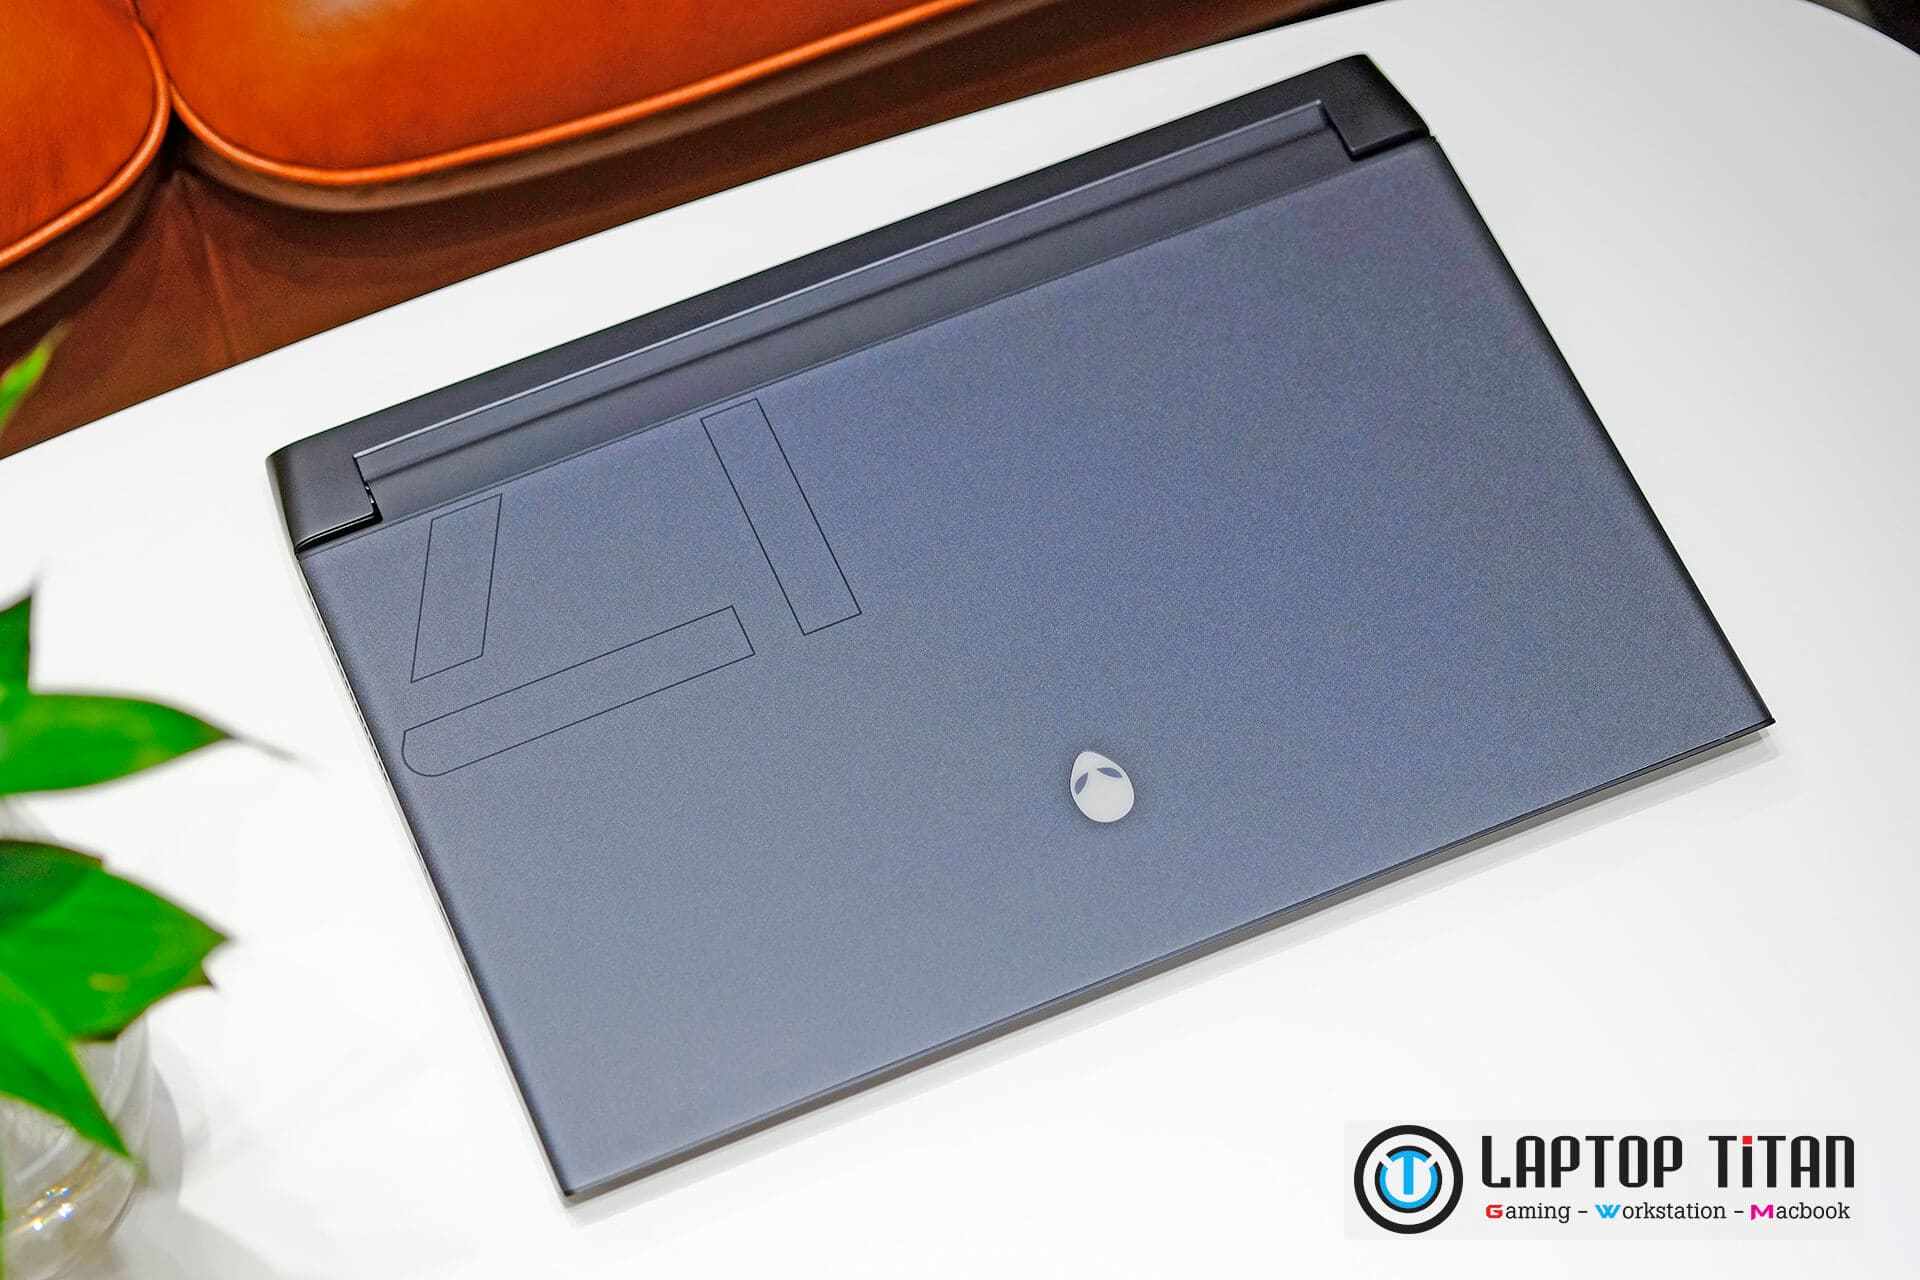 Dell Alienware M17 R4 Laptoptitan 02